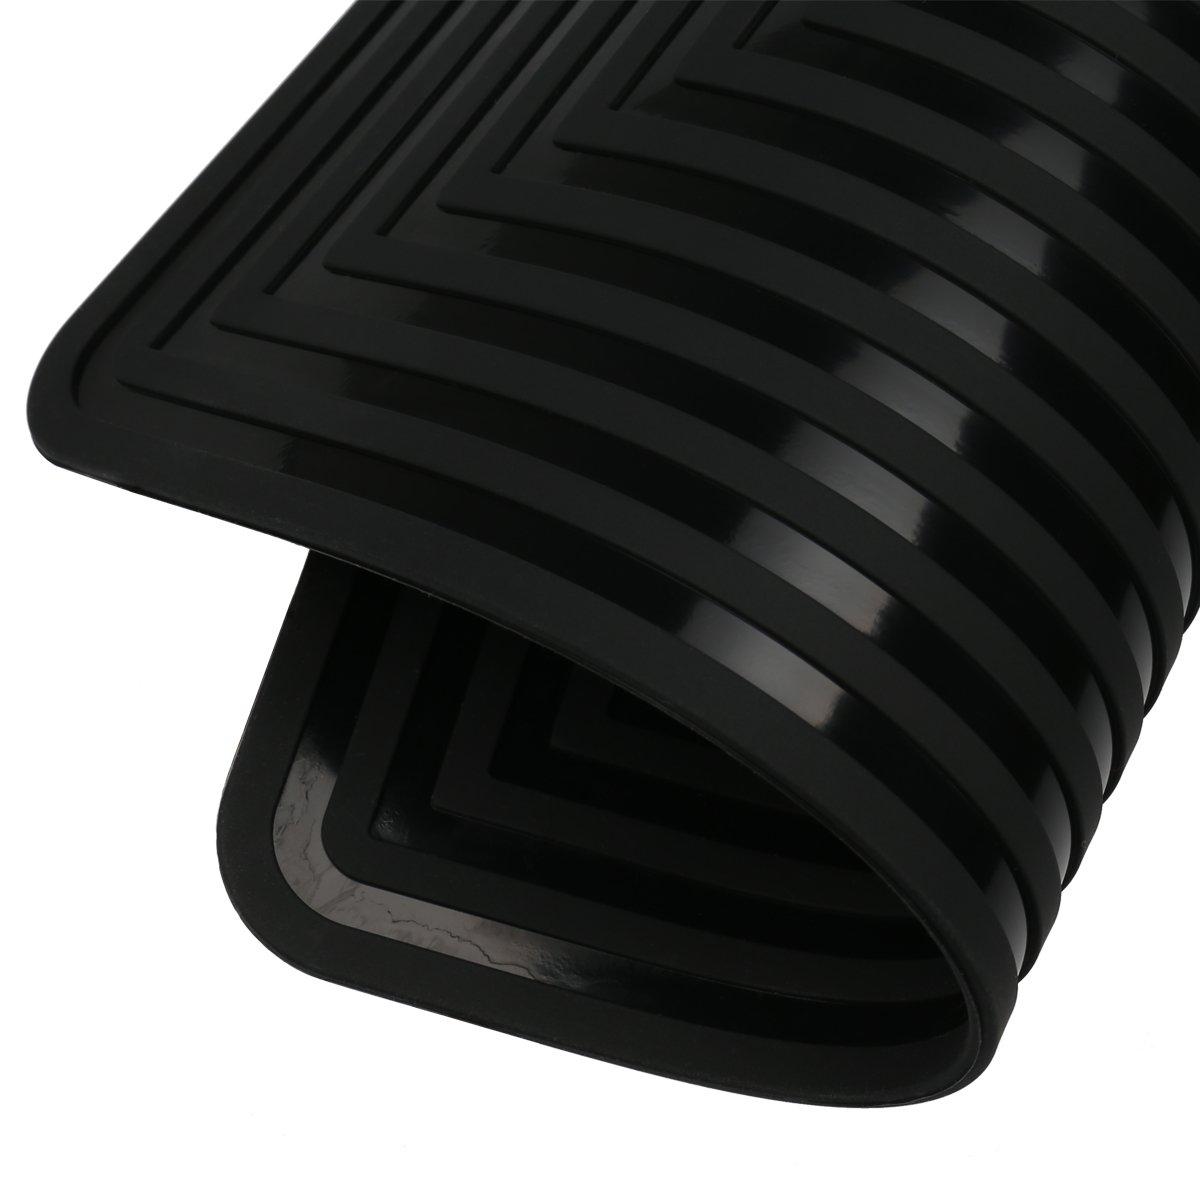 2 Pack,Silicone Trivet Mats/Hot Pads,Pot Holder,9''x12'' Non Slip Flexible Durable Heat Resistant Pot Coaster Kitchen Table Mats (Black) by LogHog (Image #7)